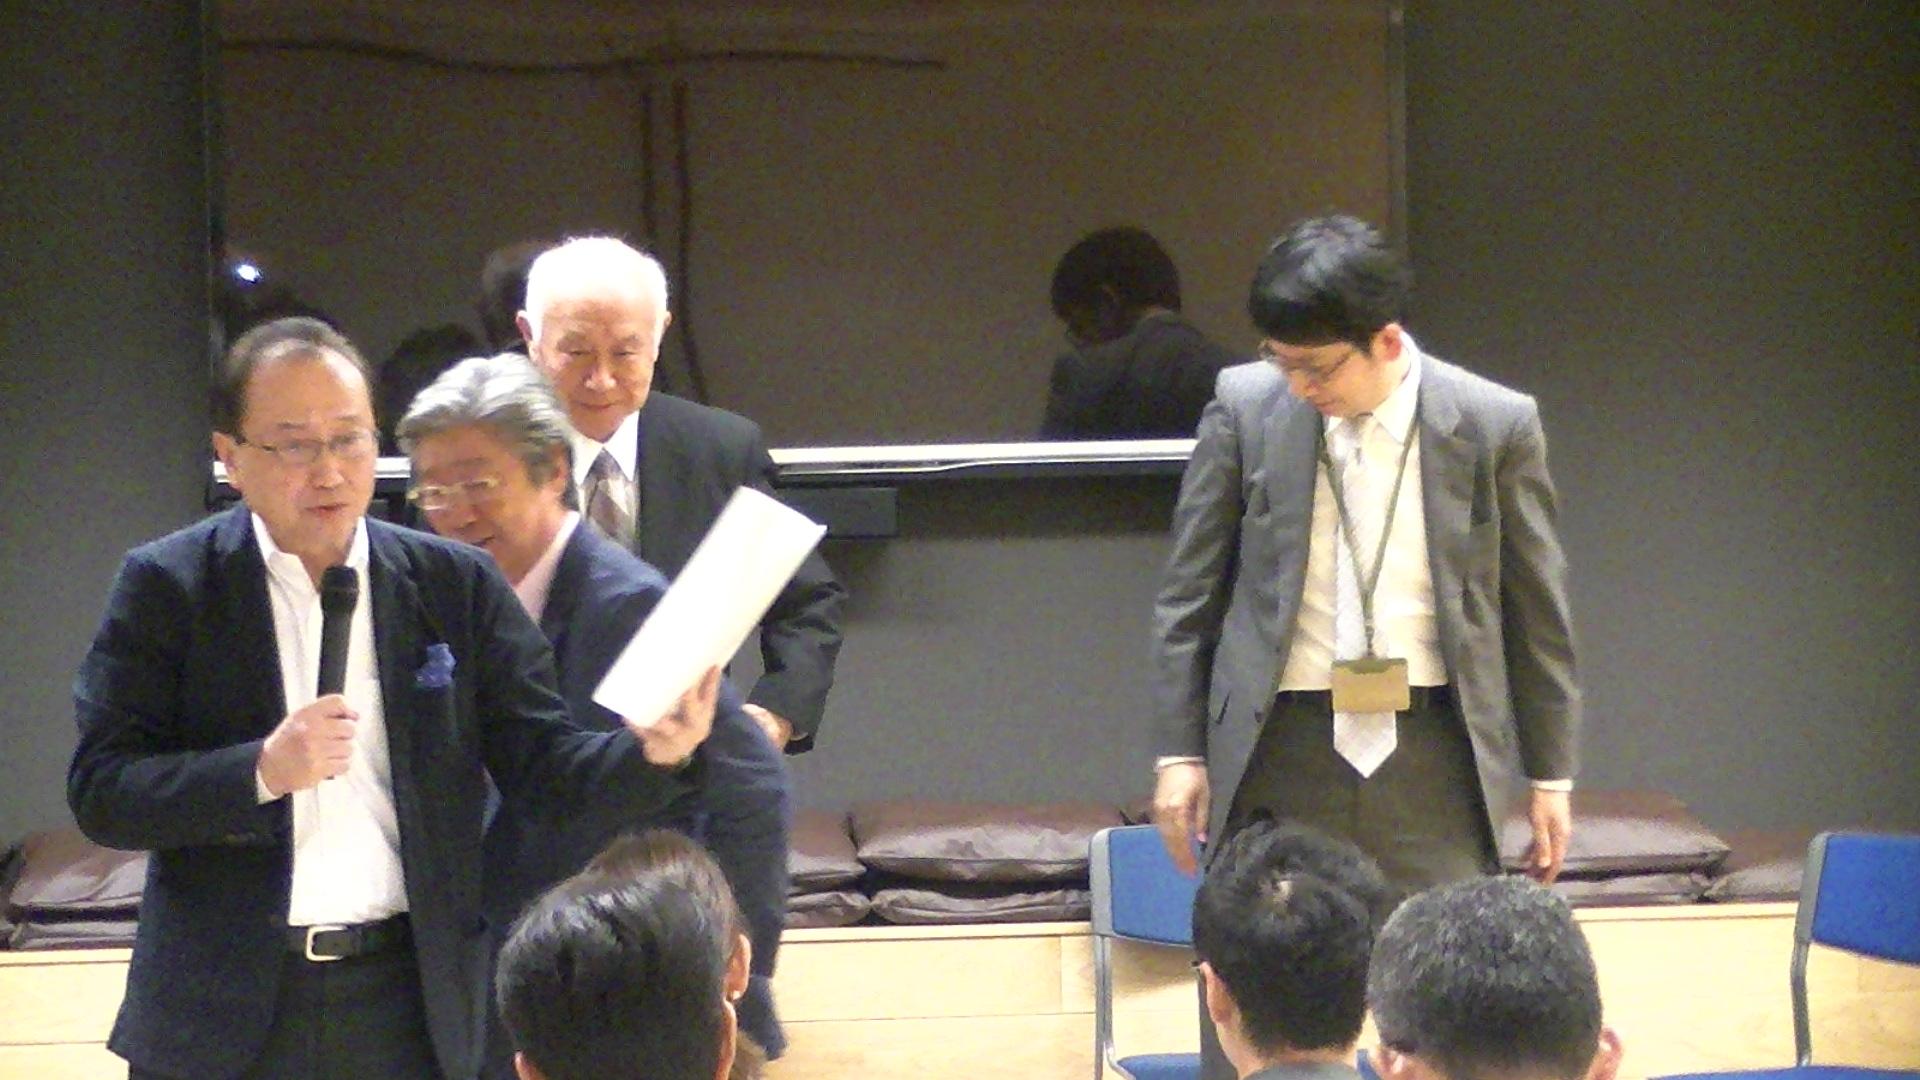 PIC 0051 - 4月1日東京思風塾の開催になります。